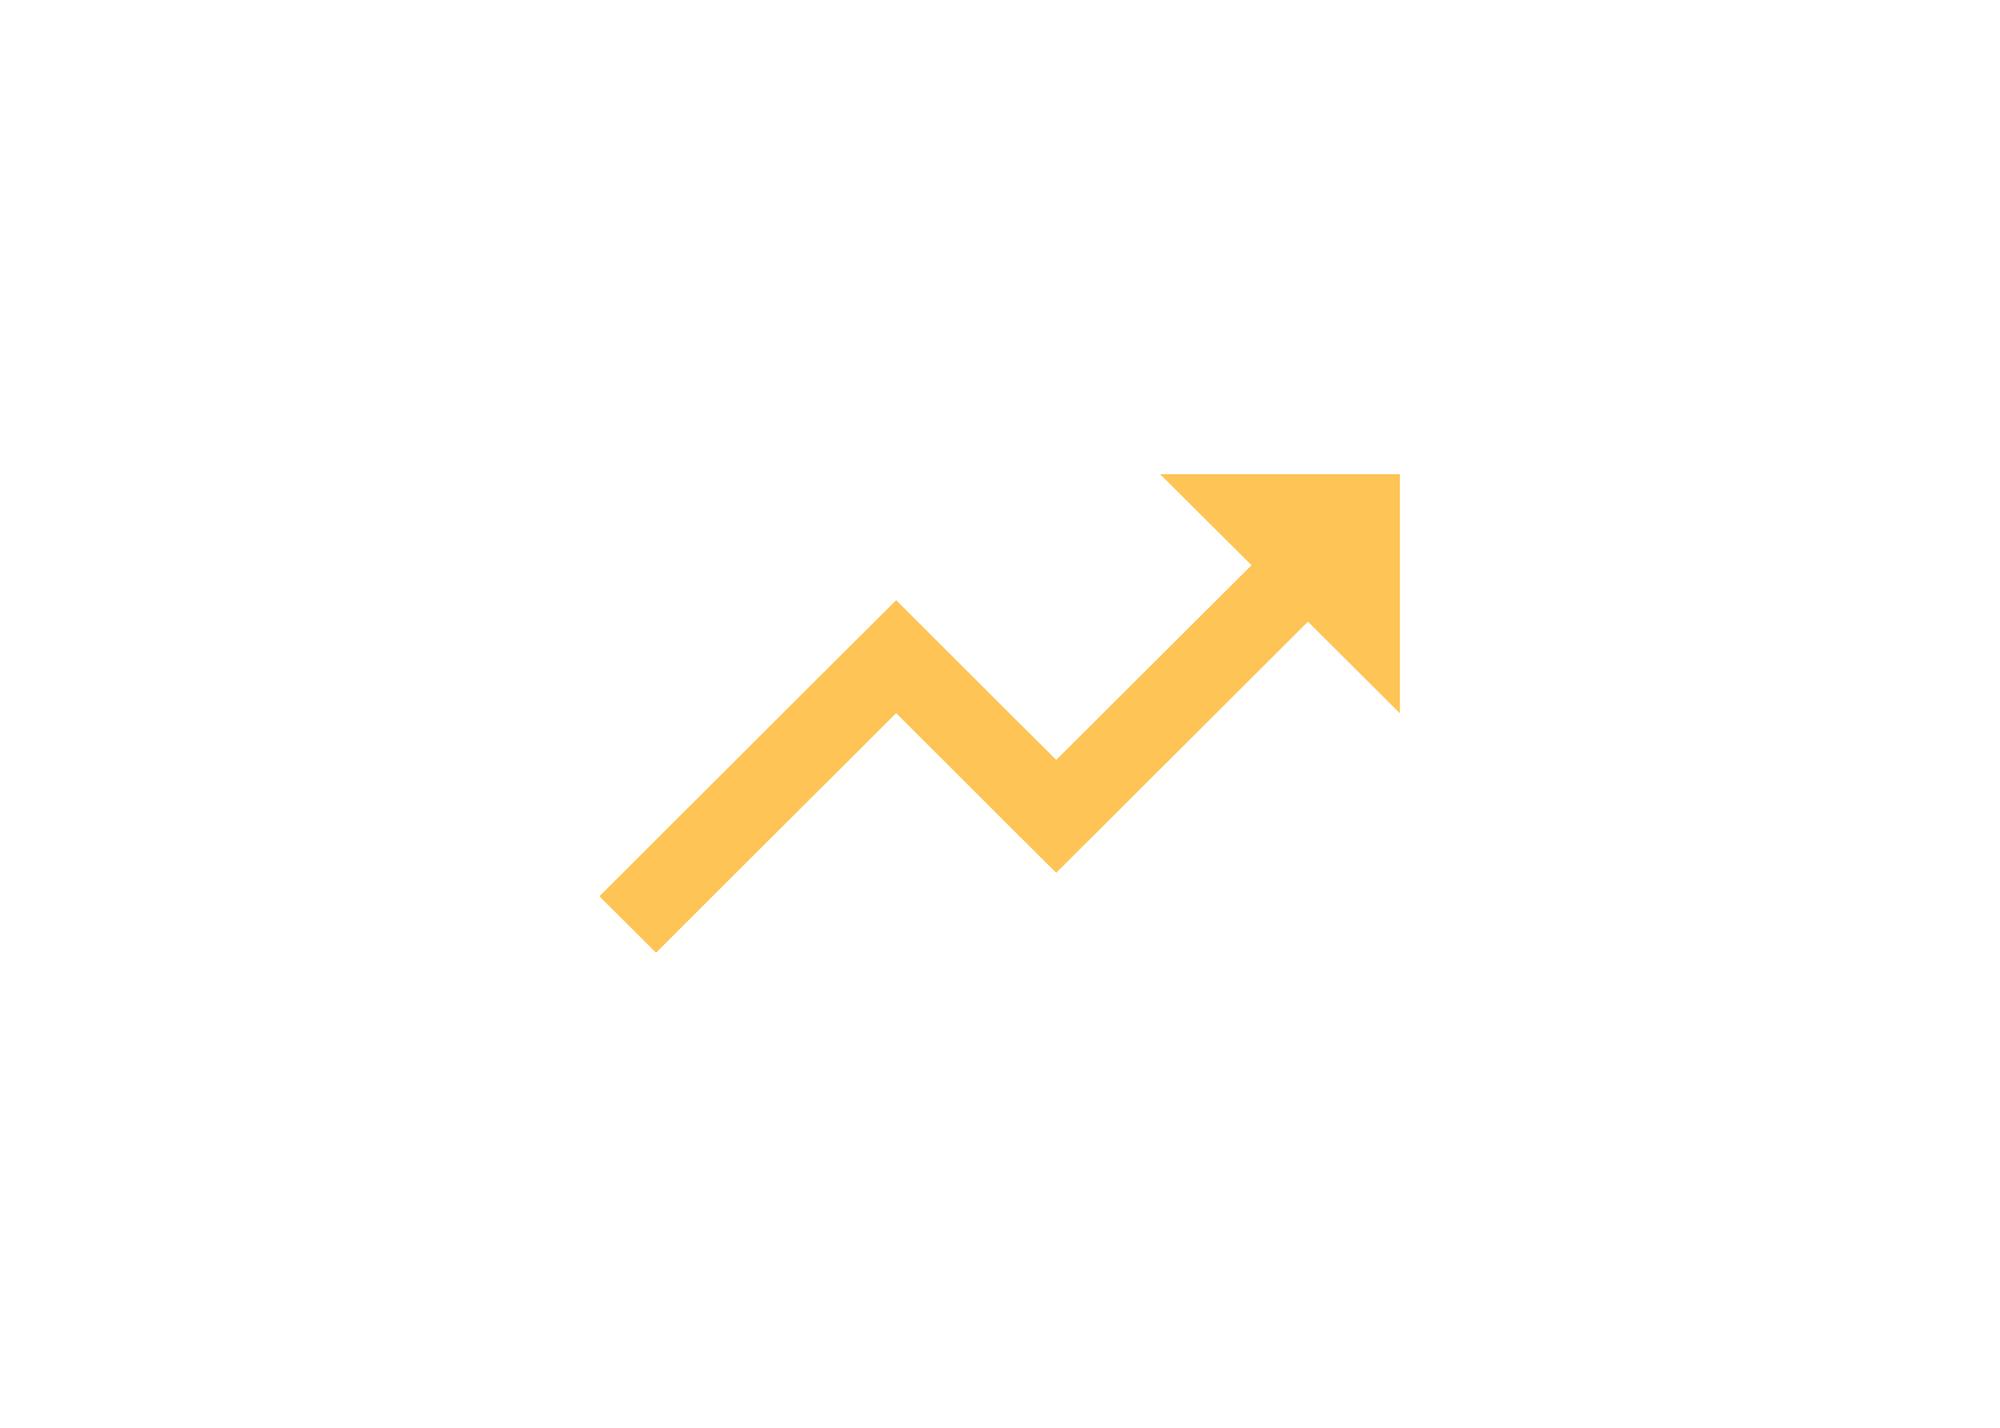 Upward pointing arrow icon